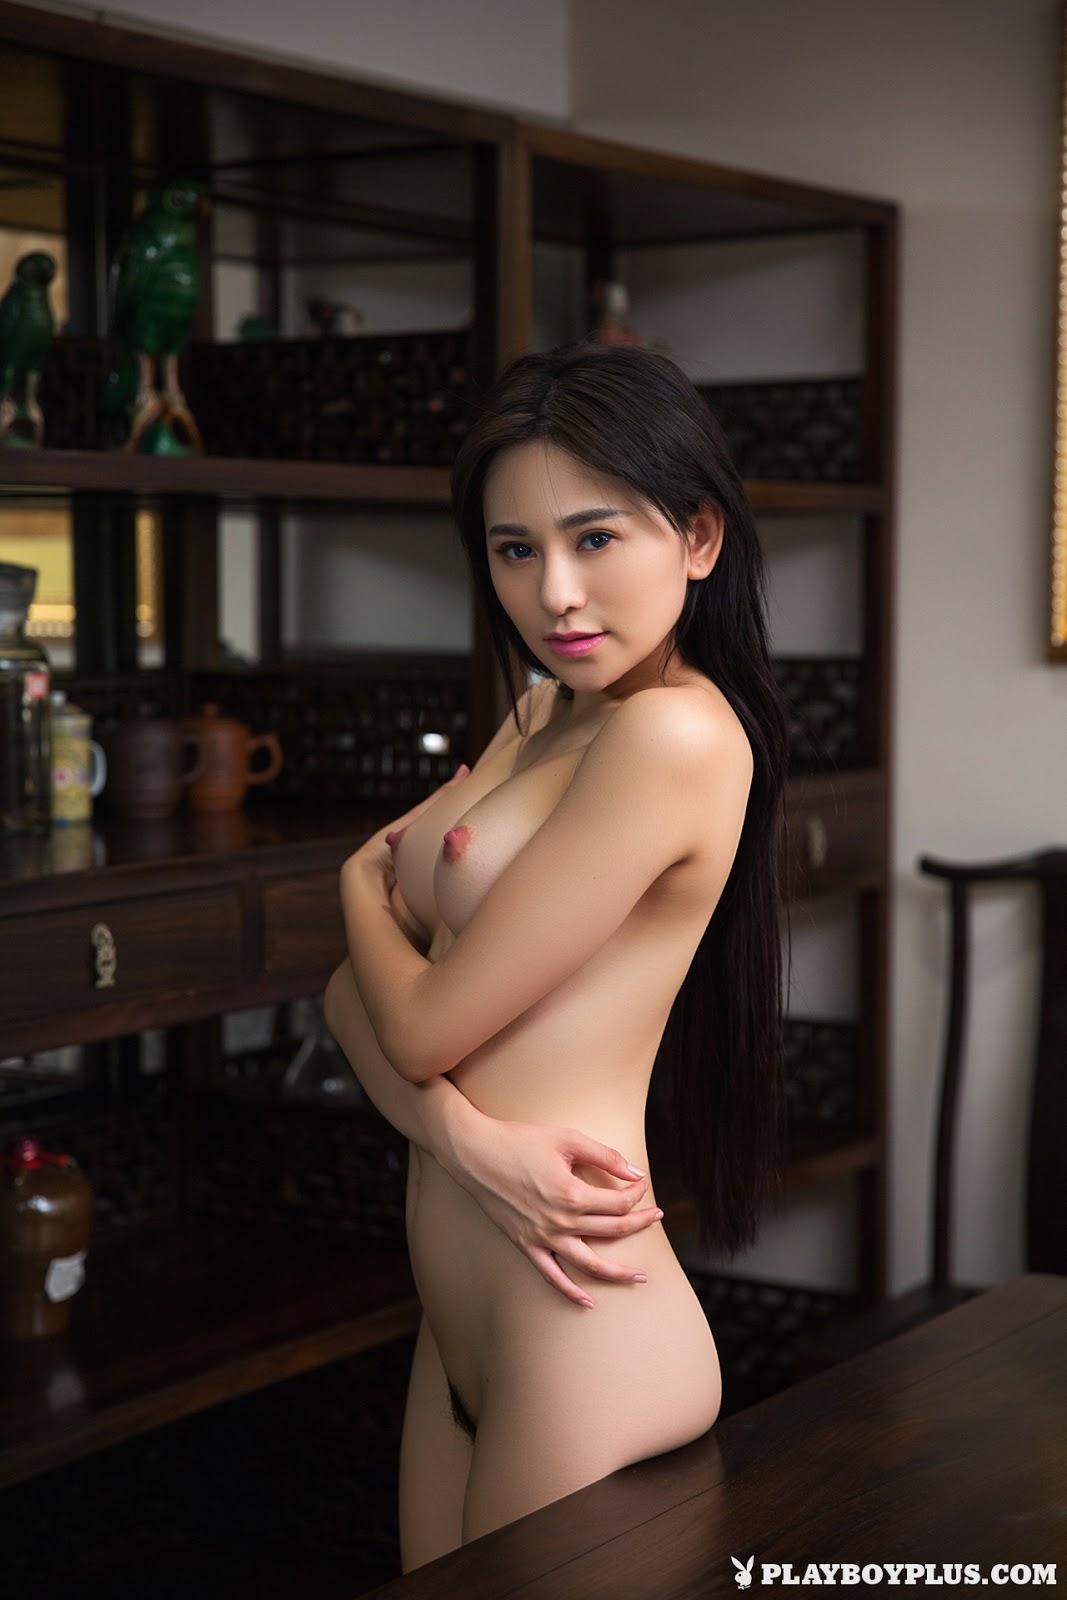 leslie stefanson nude pic